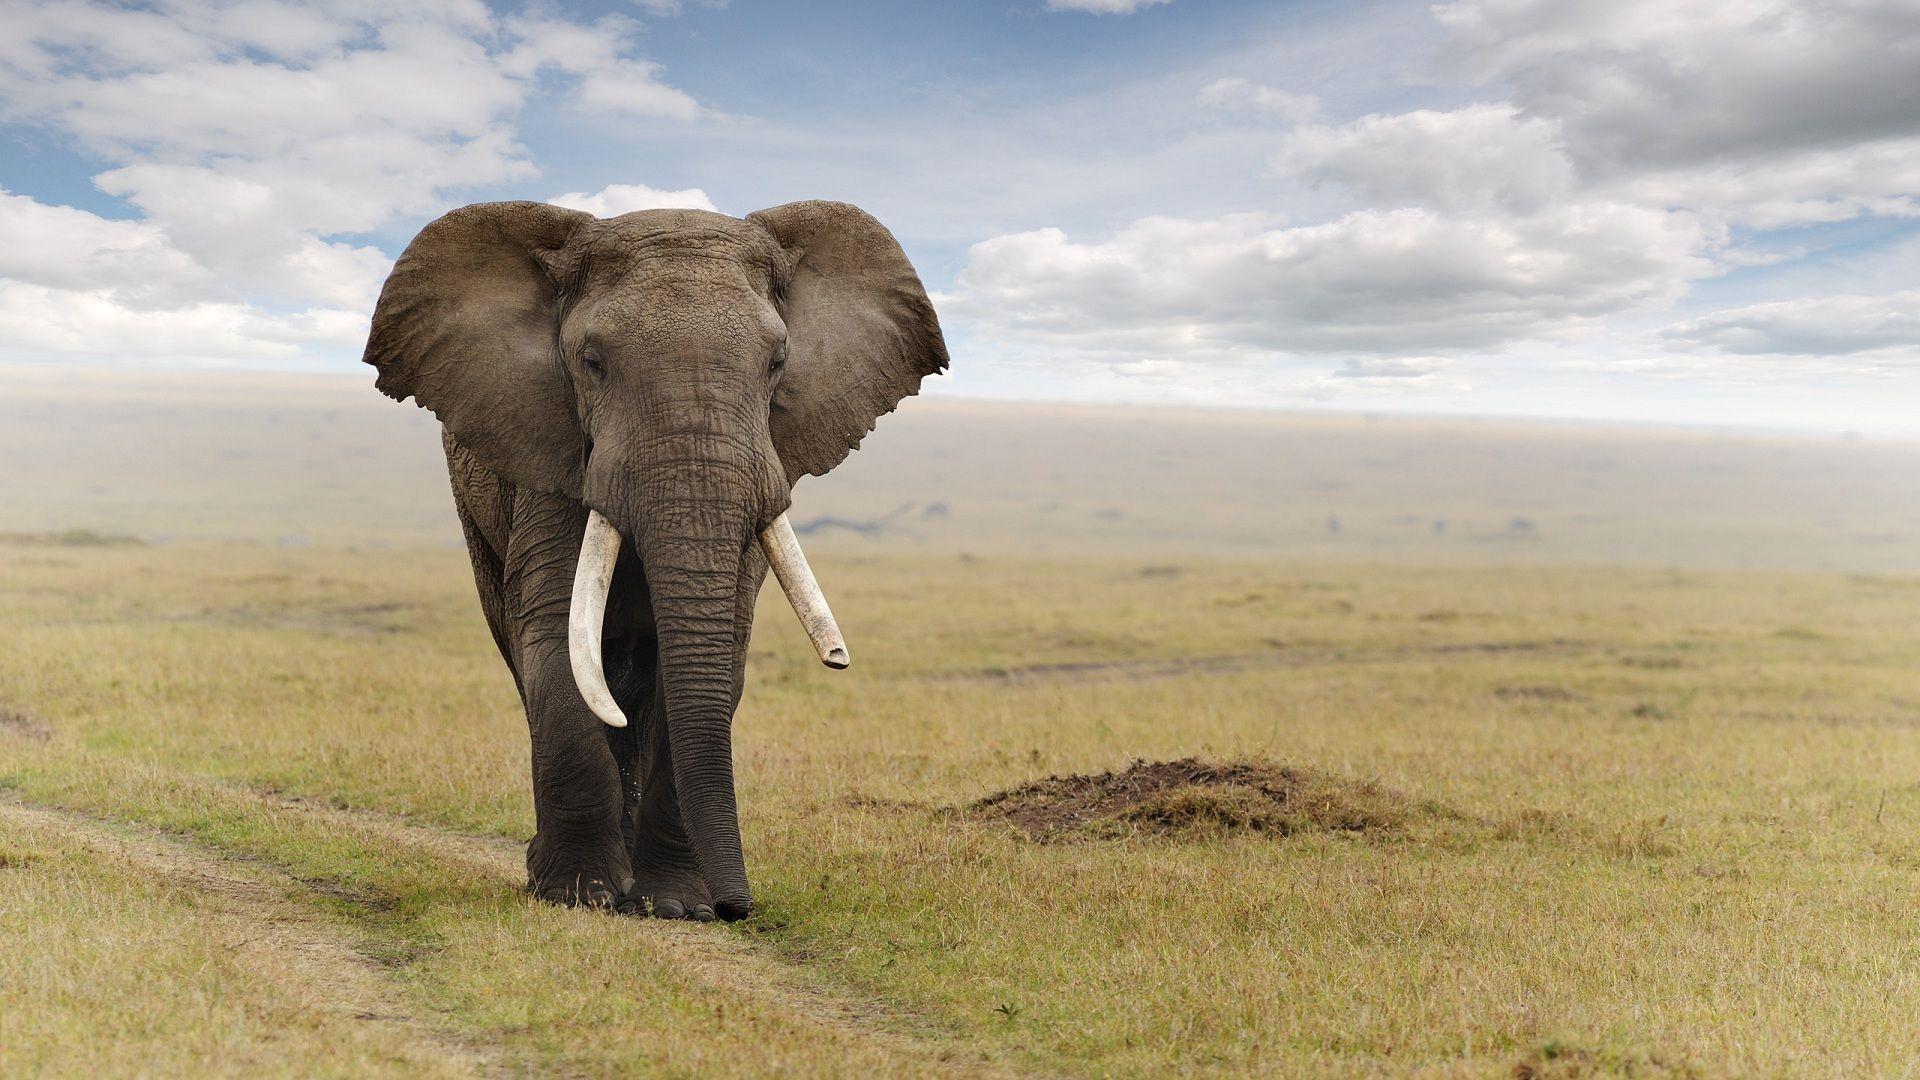 Wallpaper download elephant - Wallpaper Free Download Hd Wallpaper Elephants